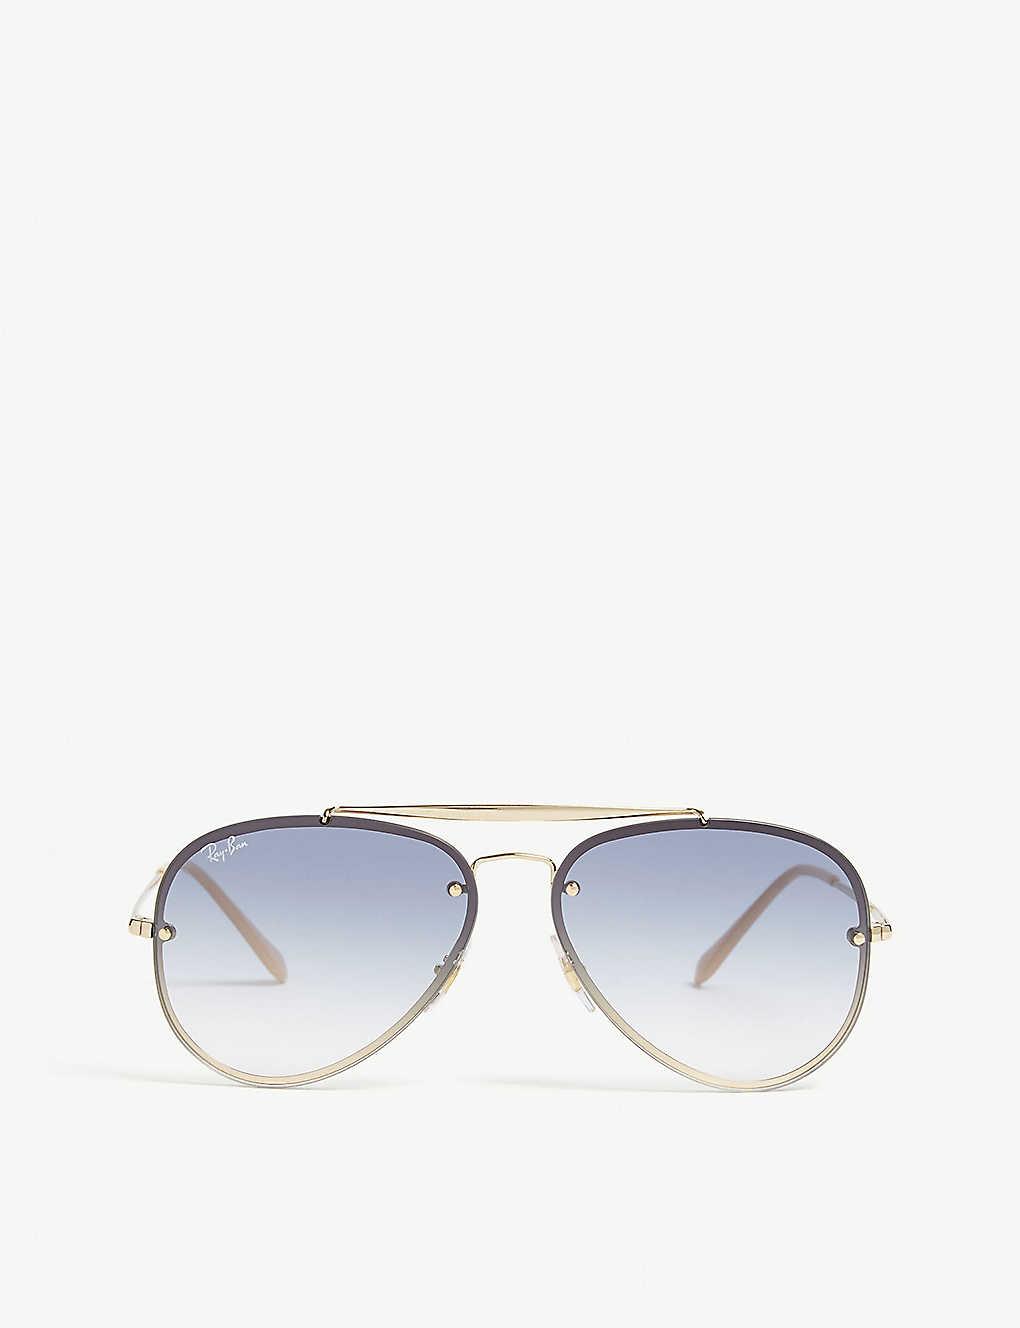 a4f9fdfb987 RAY-BAN - Rb3584 Blaze aviator sunglasses